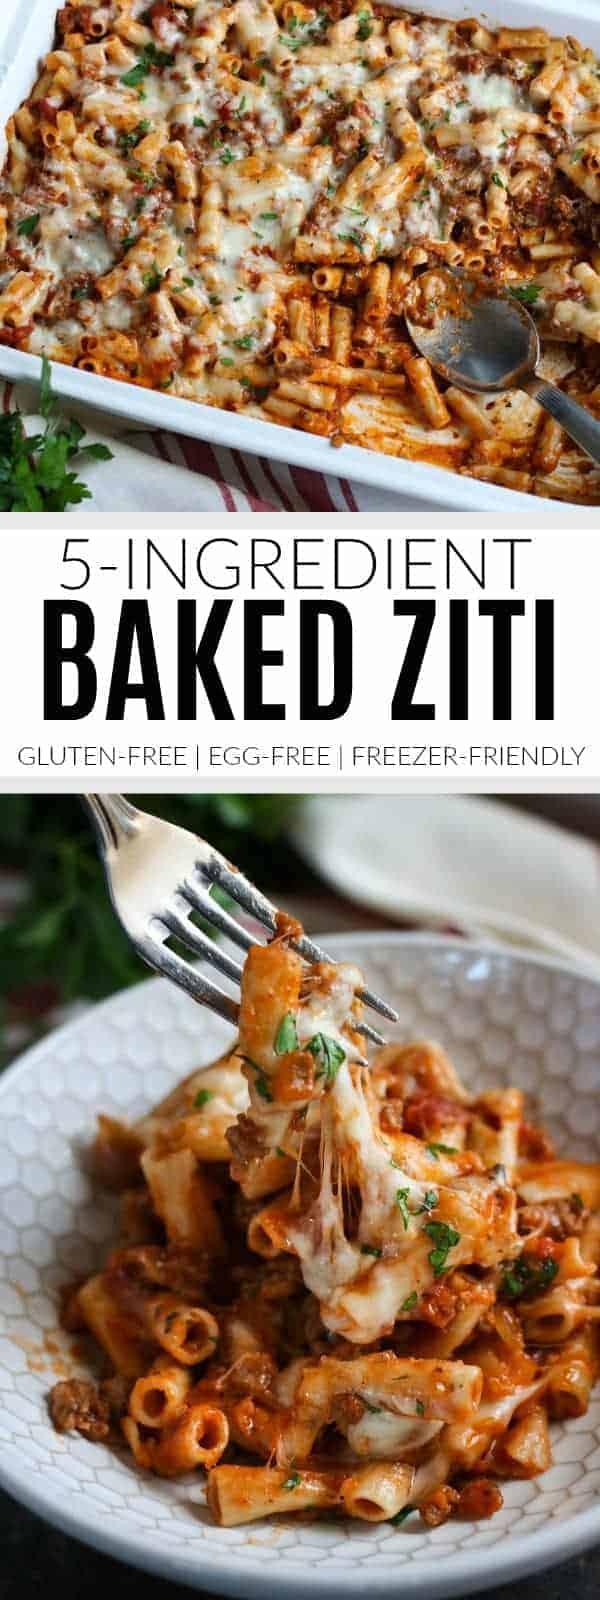 Pinterest image for baked ziti